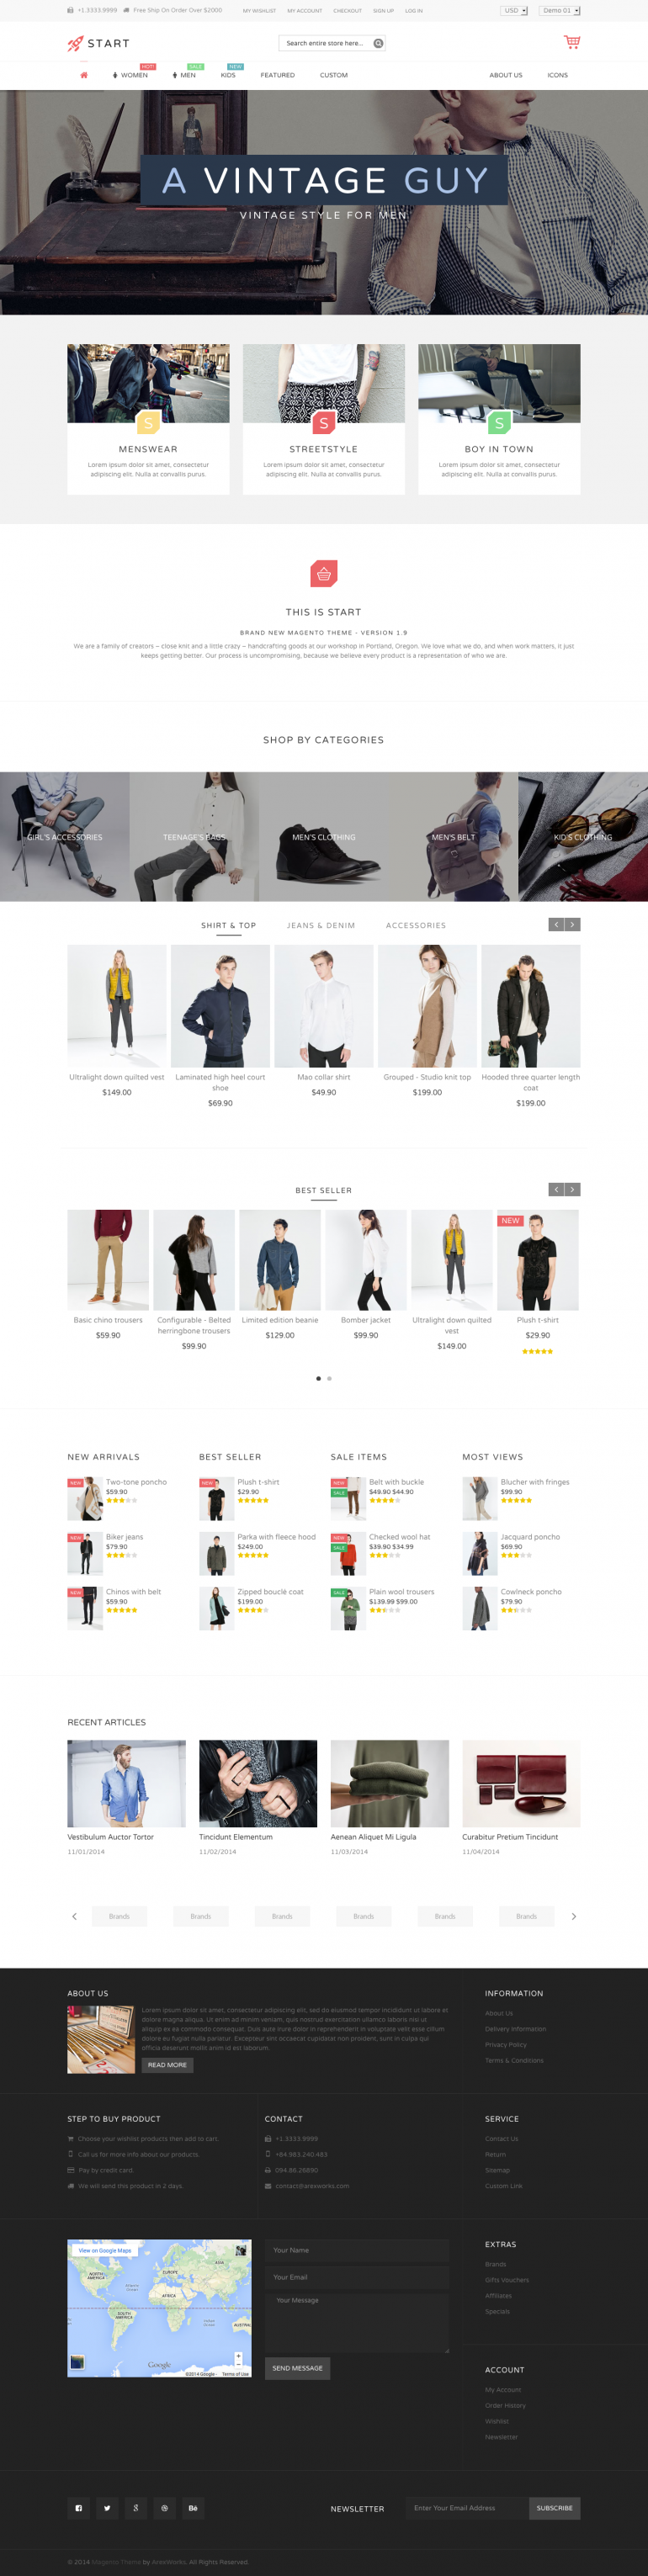 Start – Minimalist Template by linharex